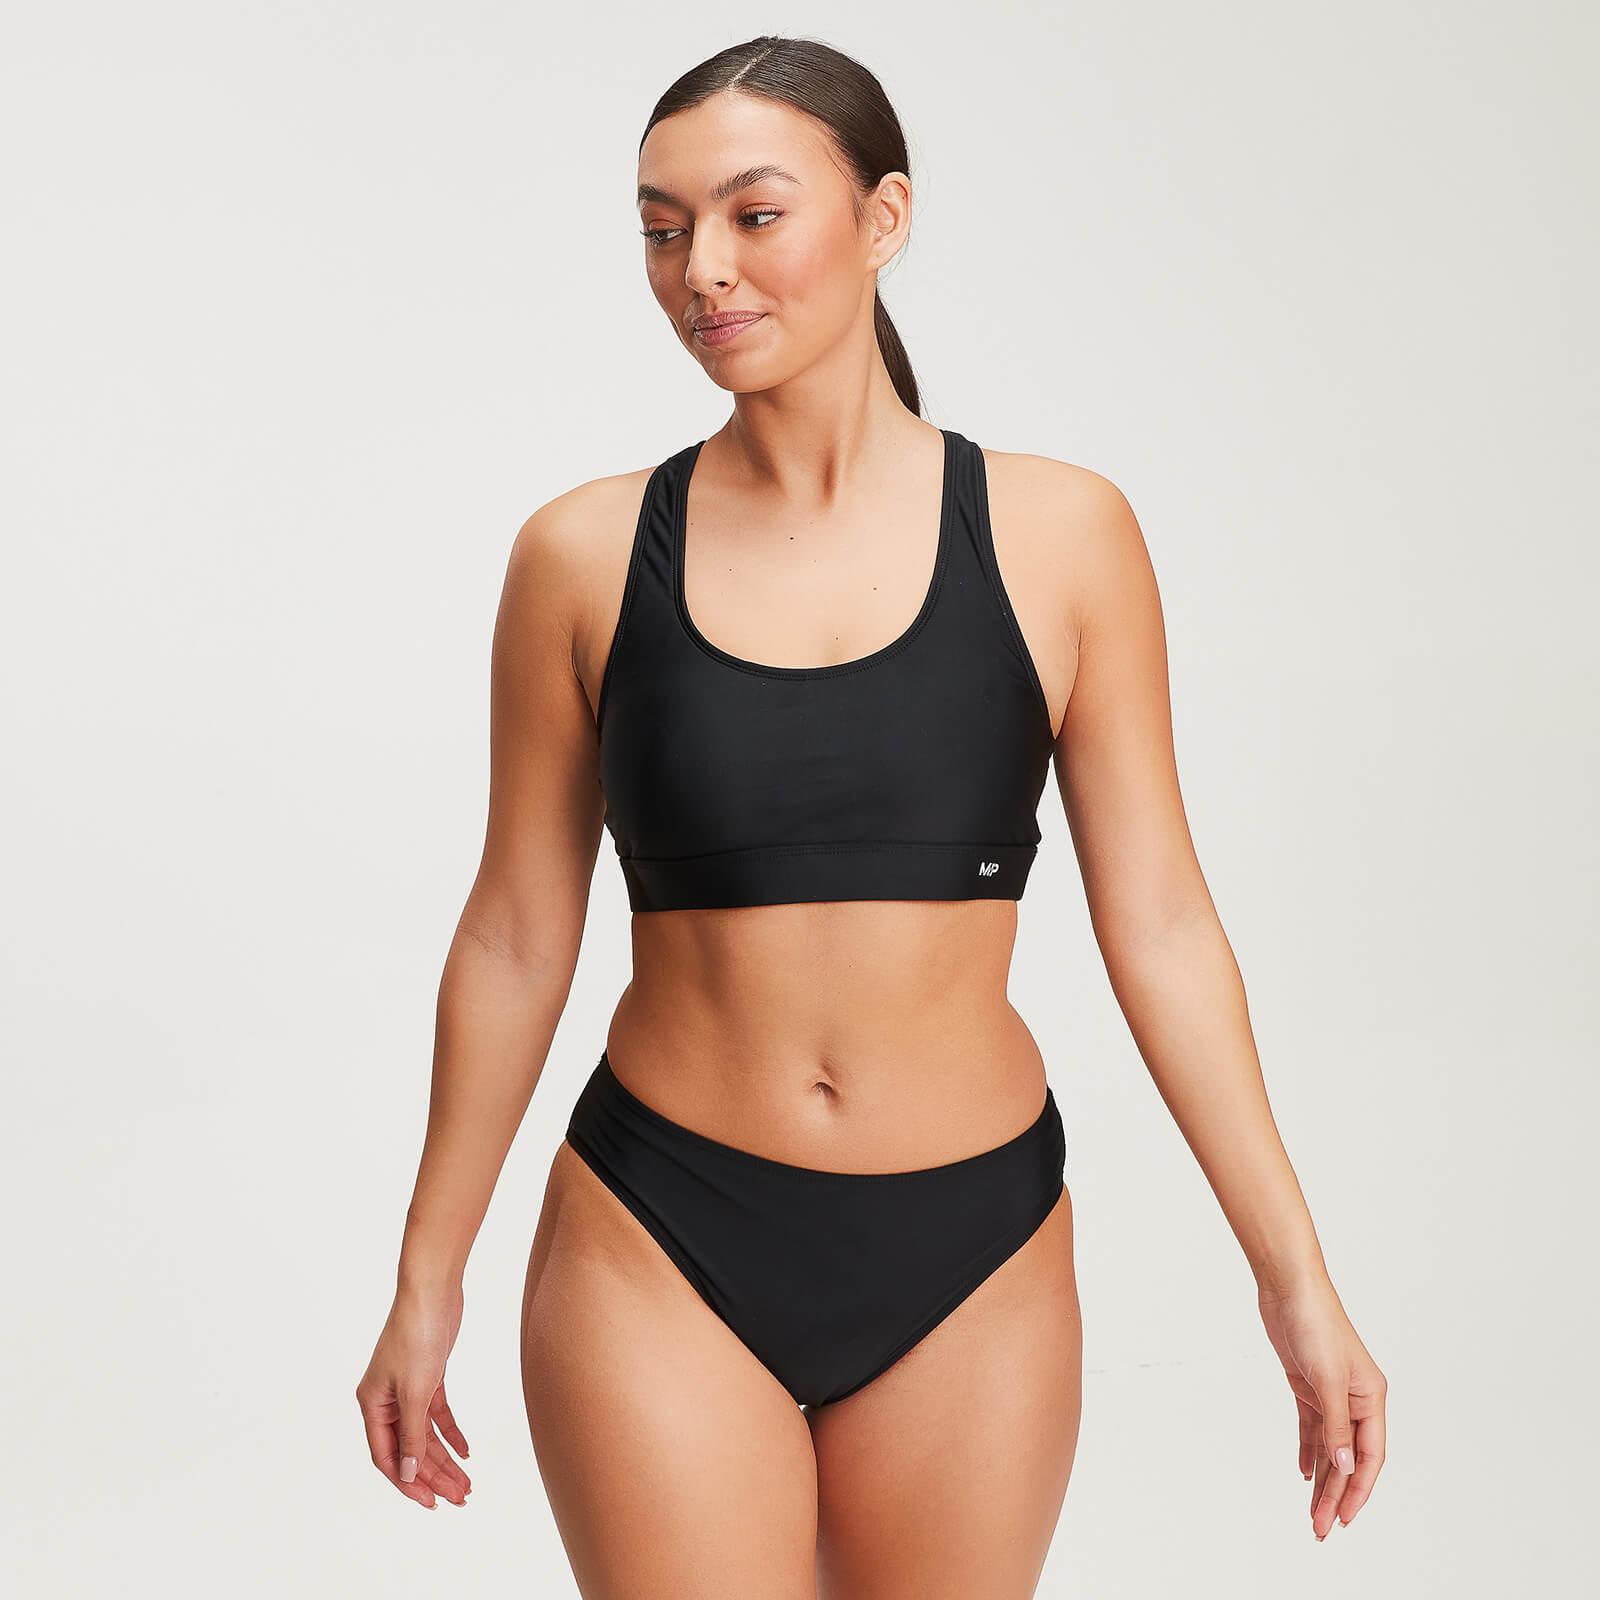 Mp Essentials Bikini Top - Til Kvinder - Sort - Xxs